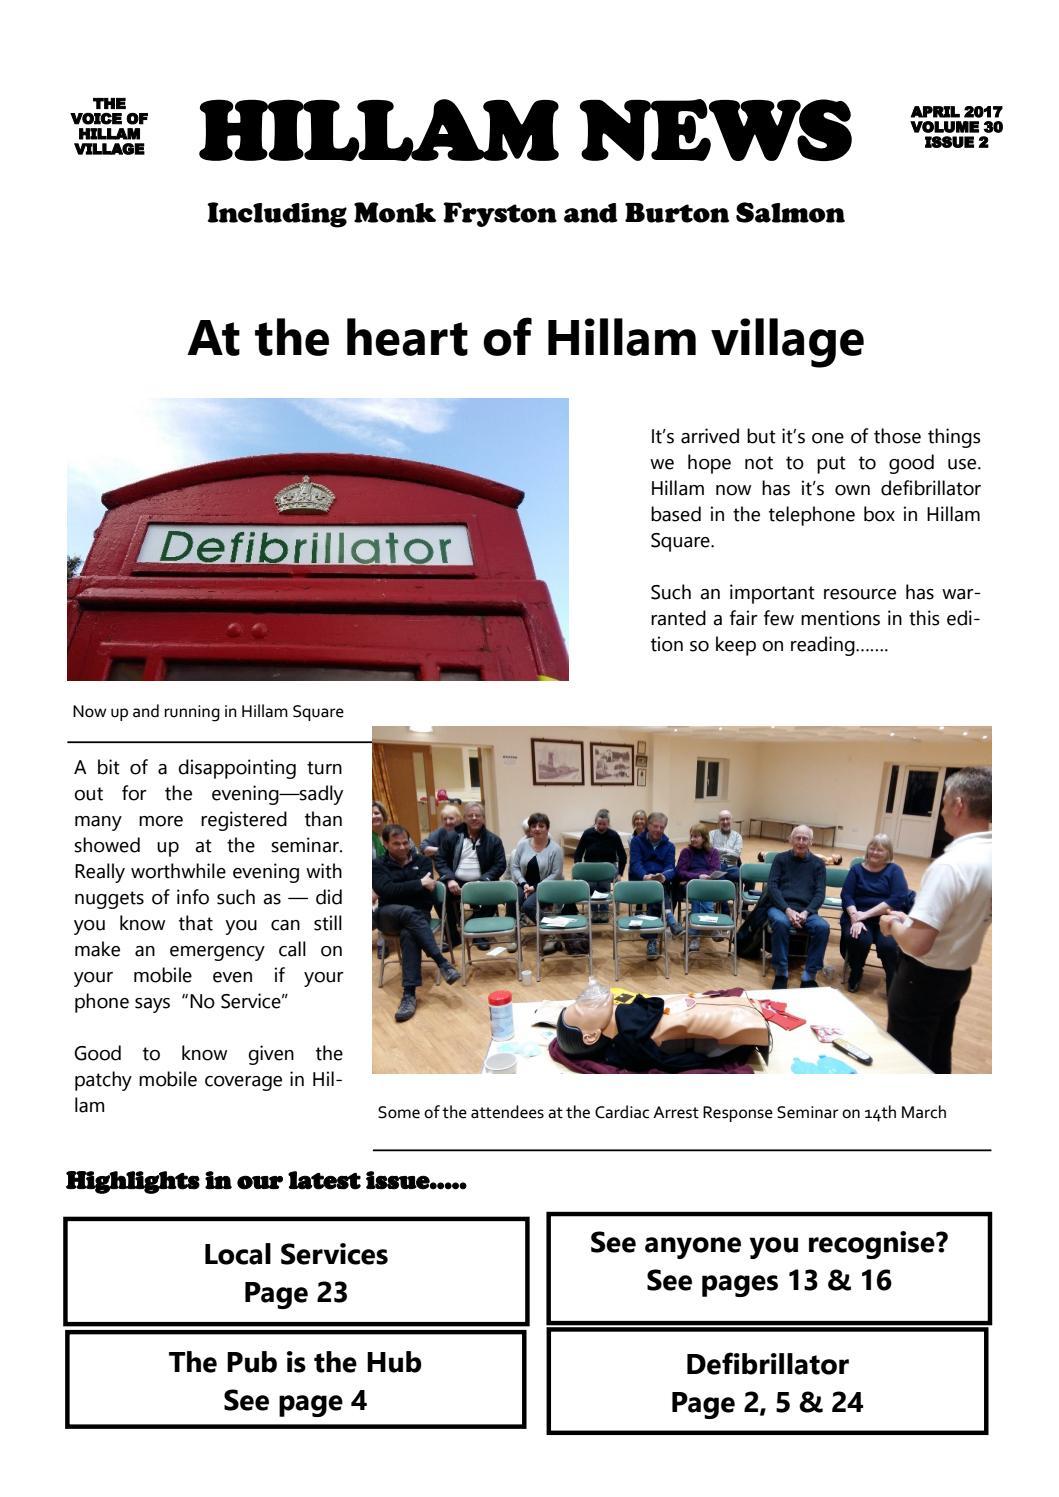 126b47723e7a3 2017 issue 2 april hillam news by Hillam News - issuu